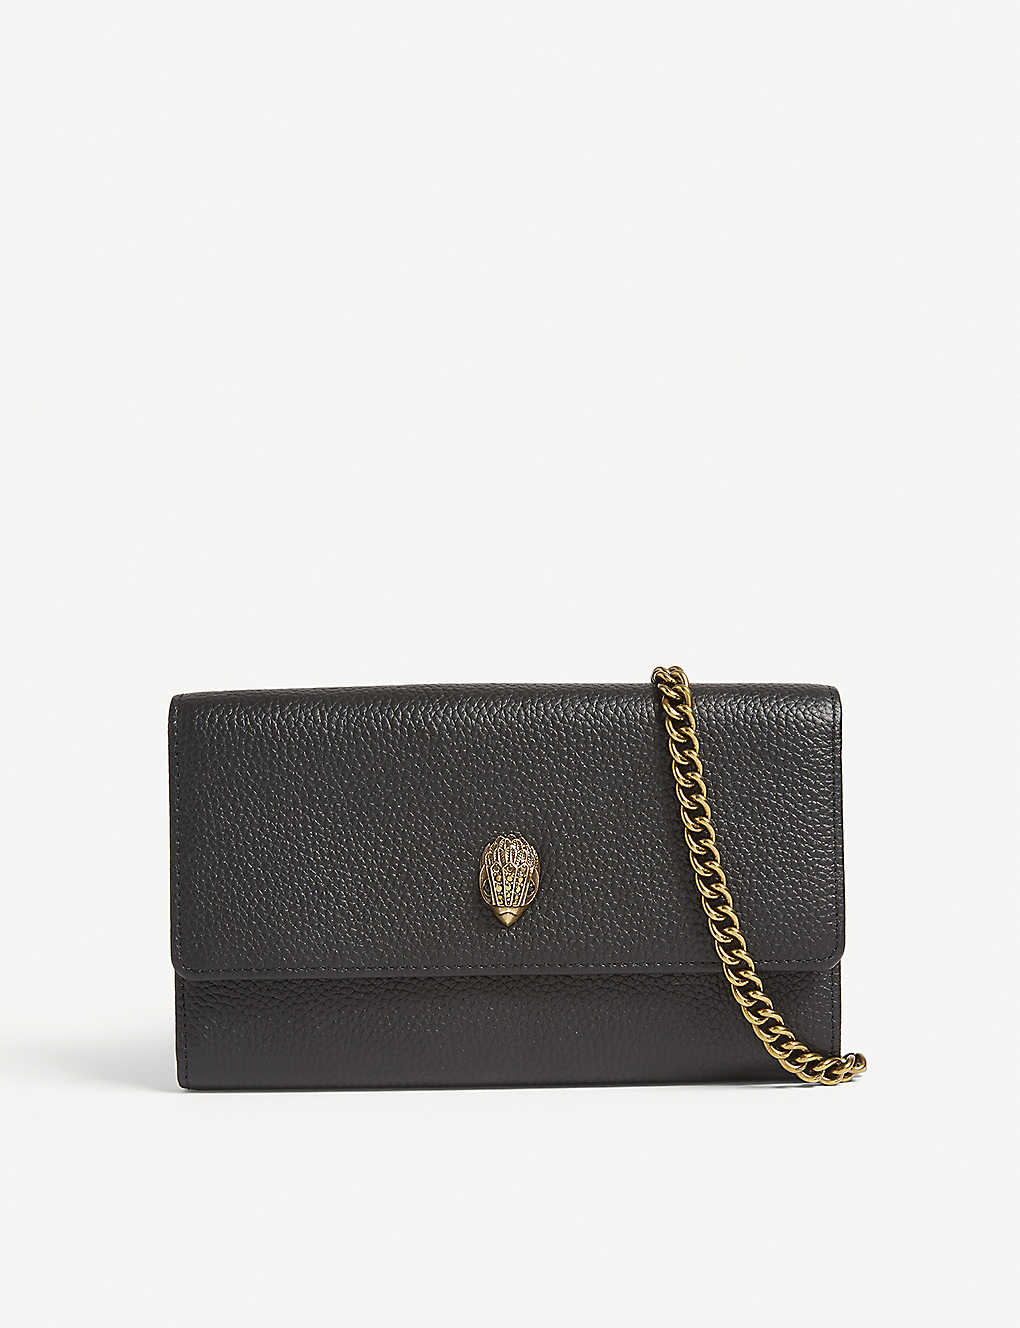 83f7405928bf KURT GEIGER LONDON - Kensington wallet-on-chain